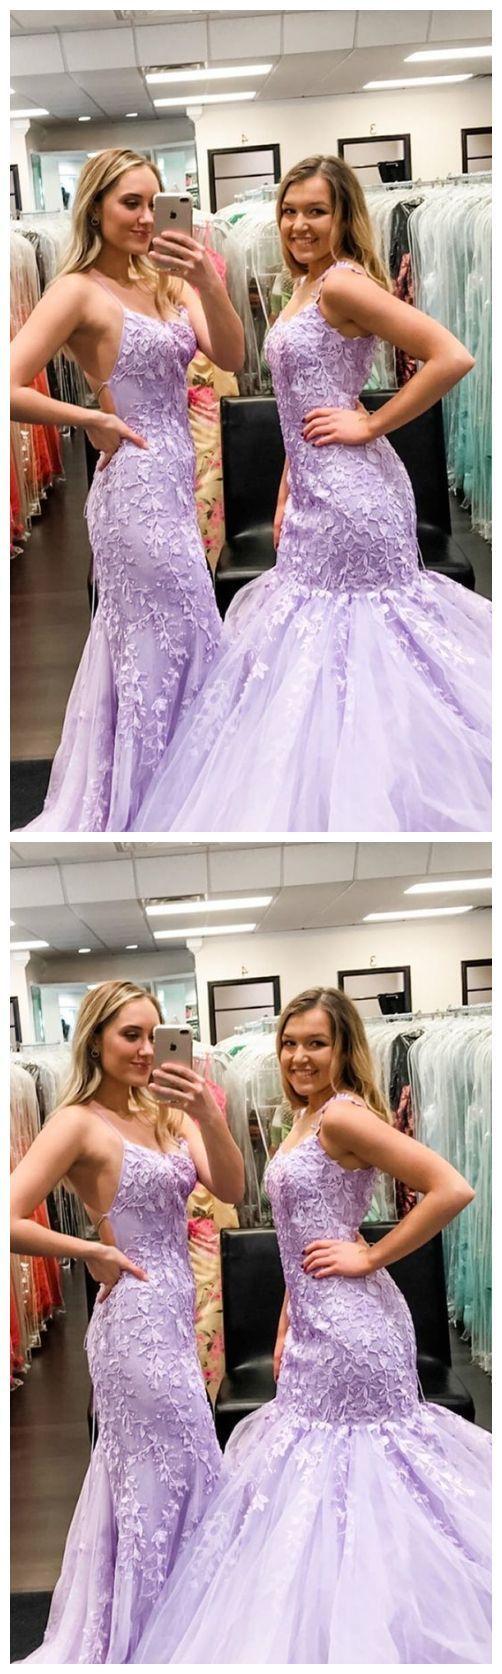 elegant mermaid prom dresses, lilac lace long prom dresses, formal prom dresses